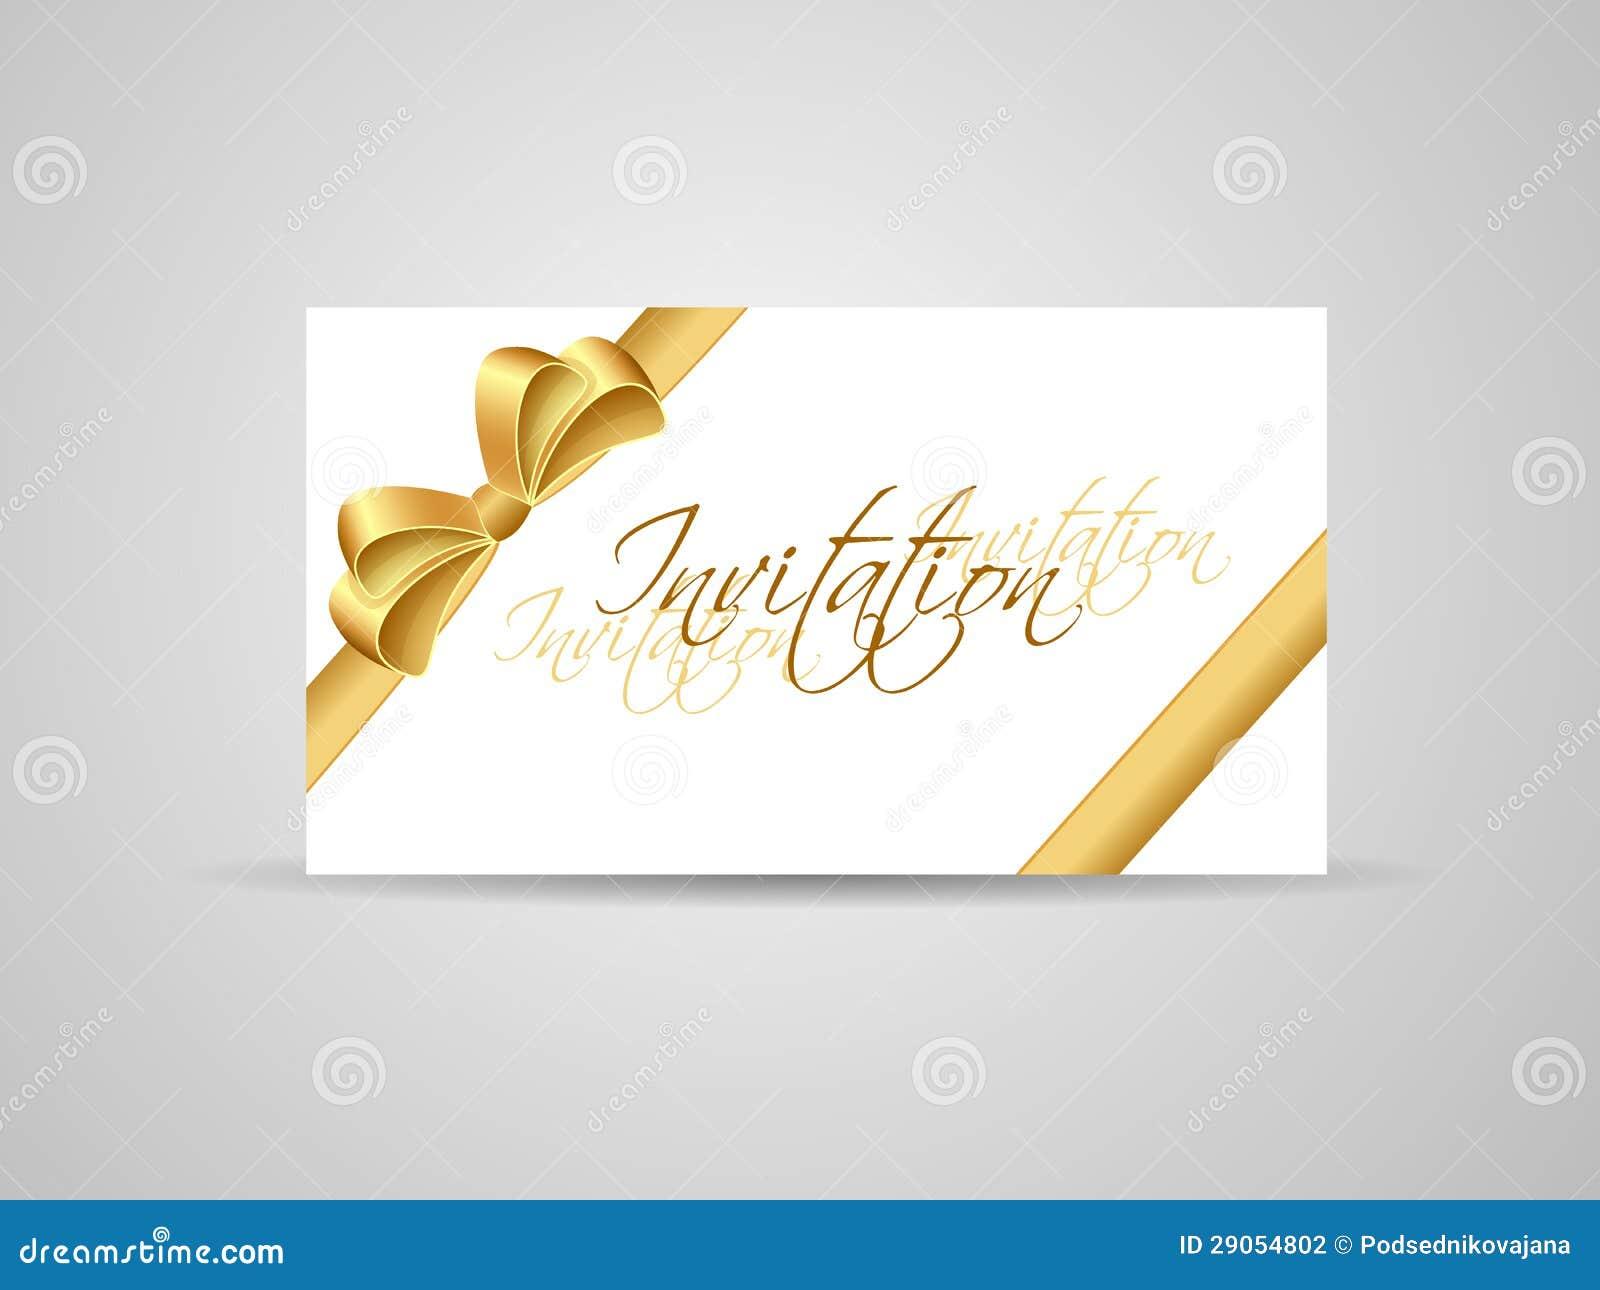 Golden Birthday Invitations was amazing invitation ideas